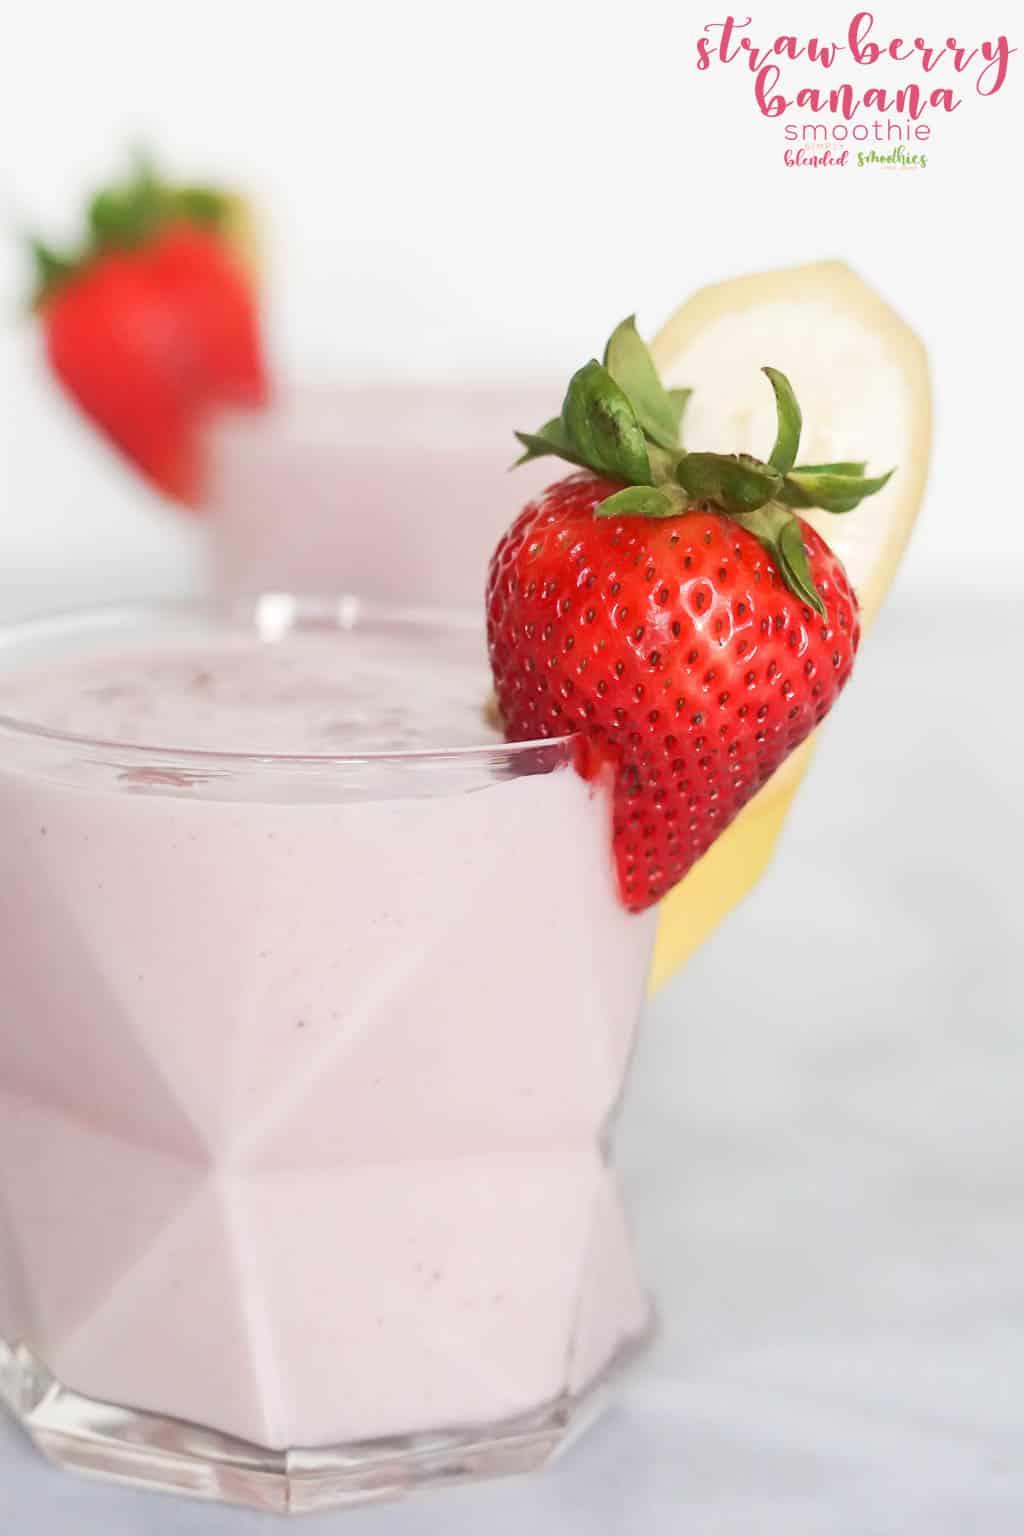 Delicious Strawberry Banana Smoothie